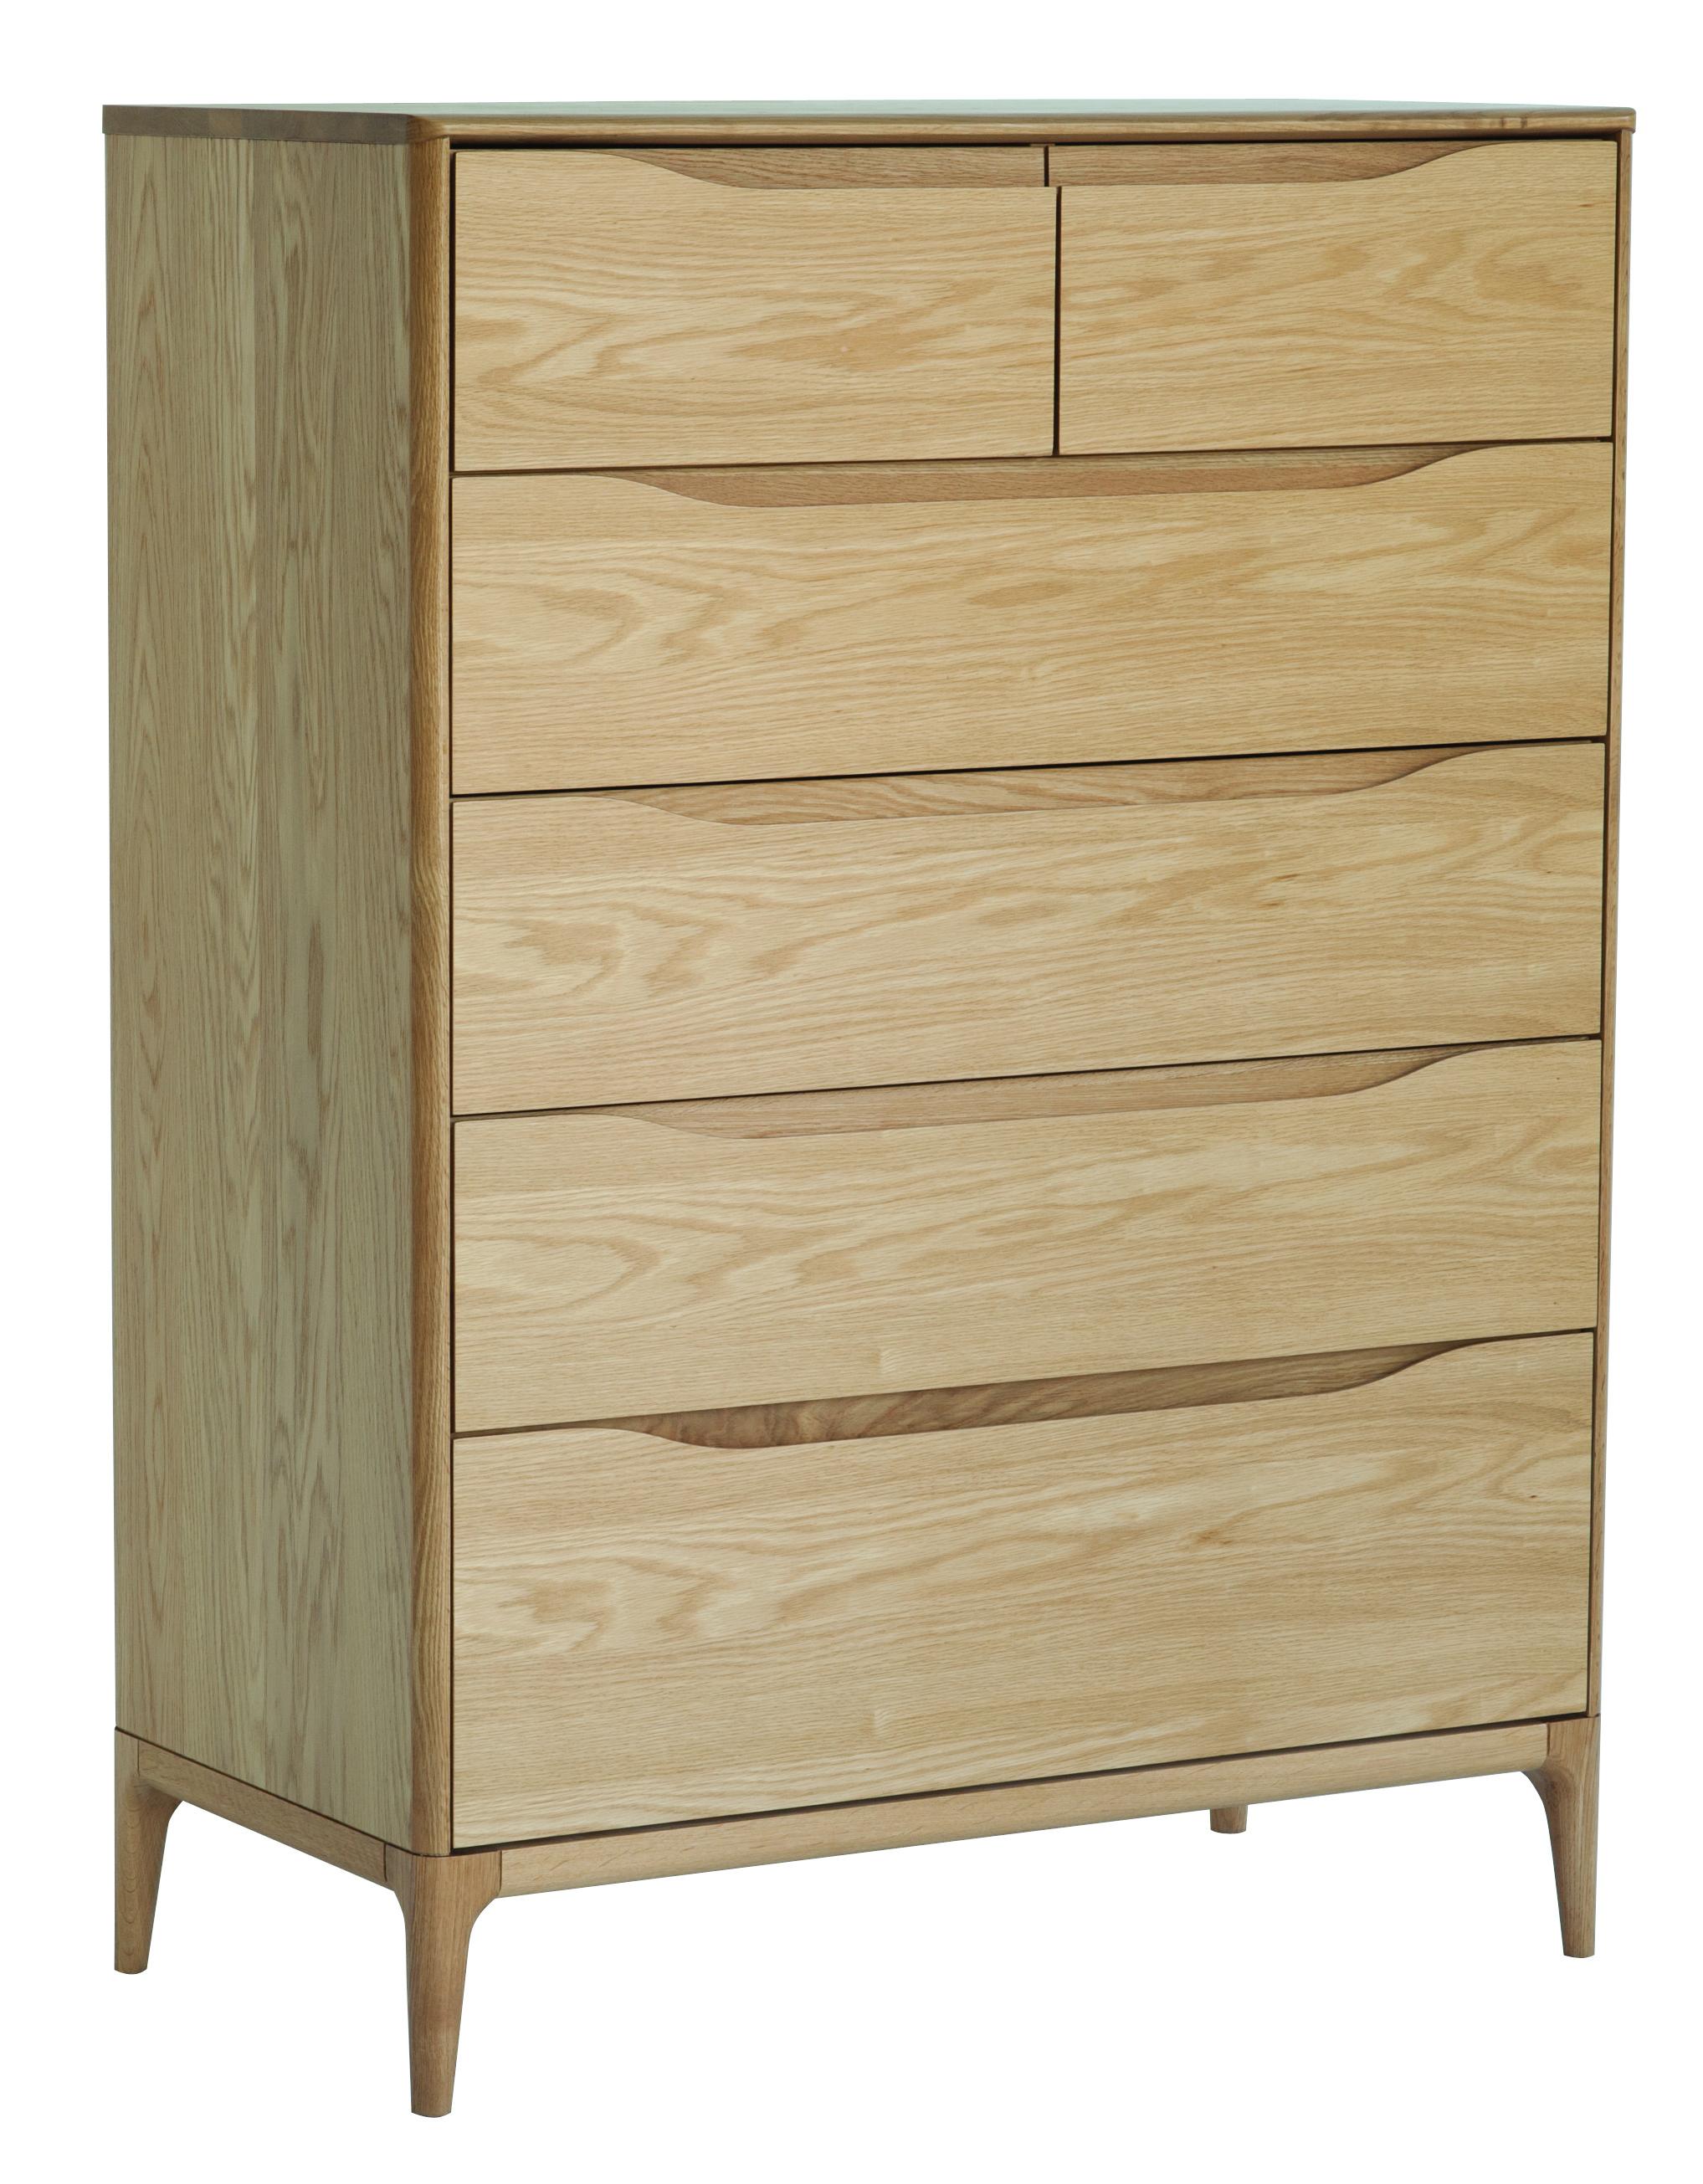 Ercol Rimini 6 Drawer Tall Wide Chest Choice Furniture